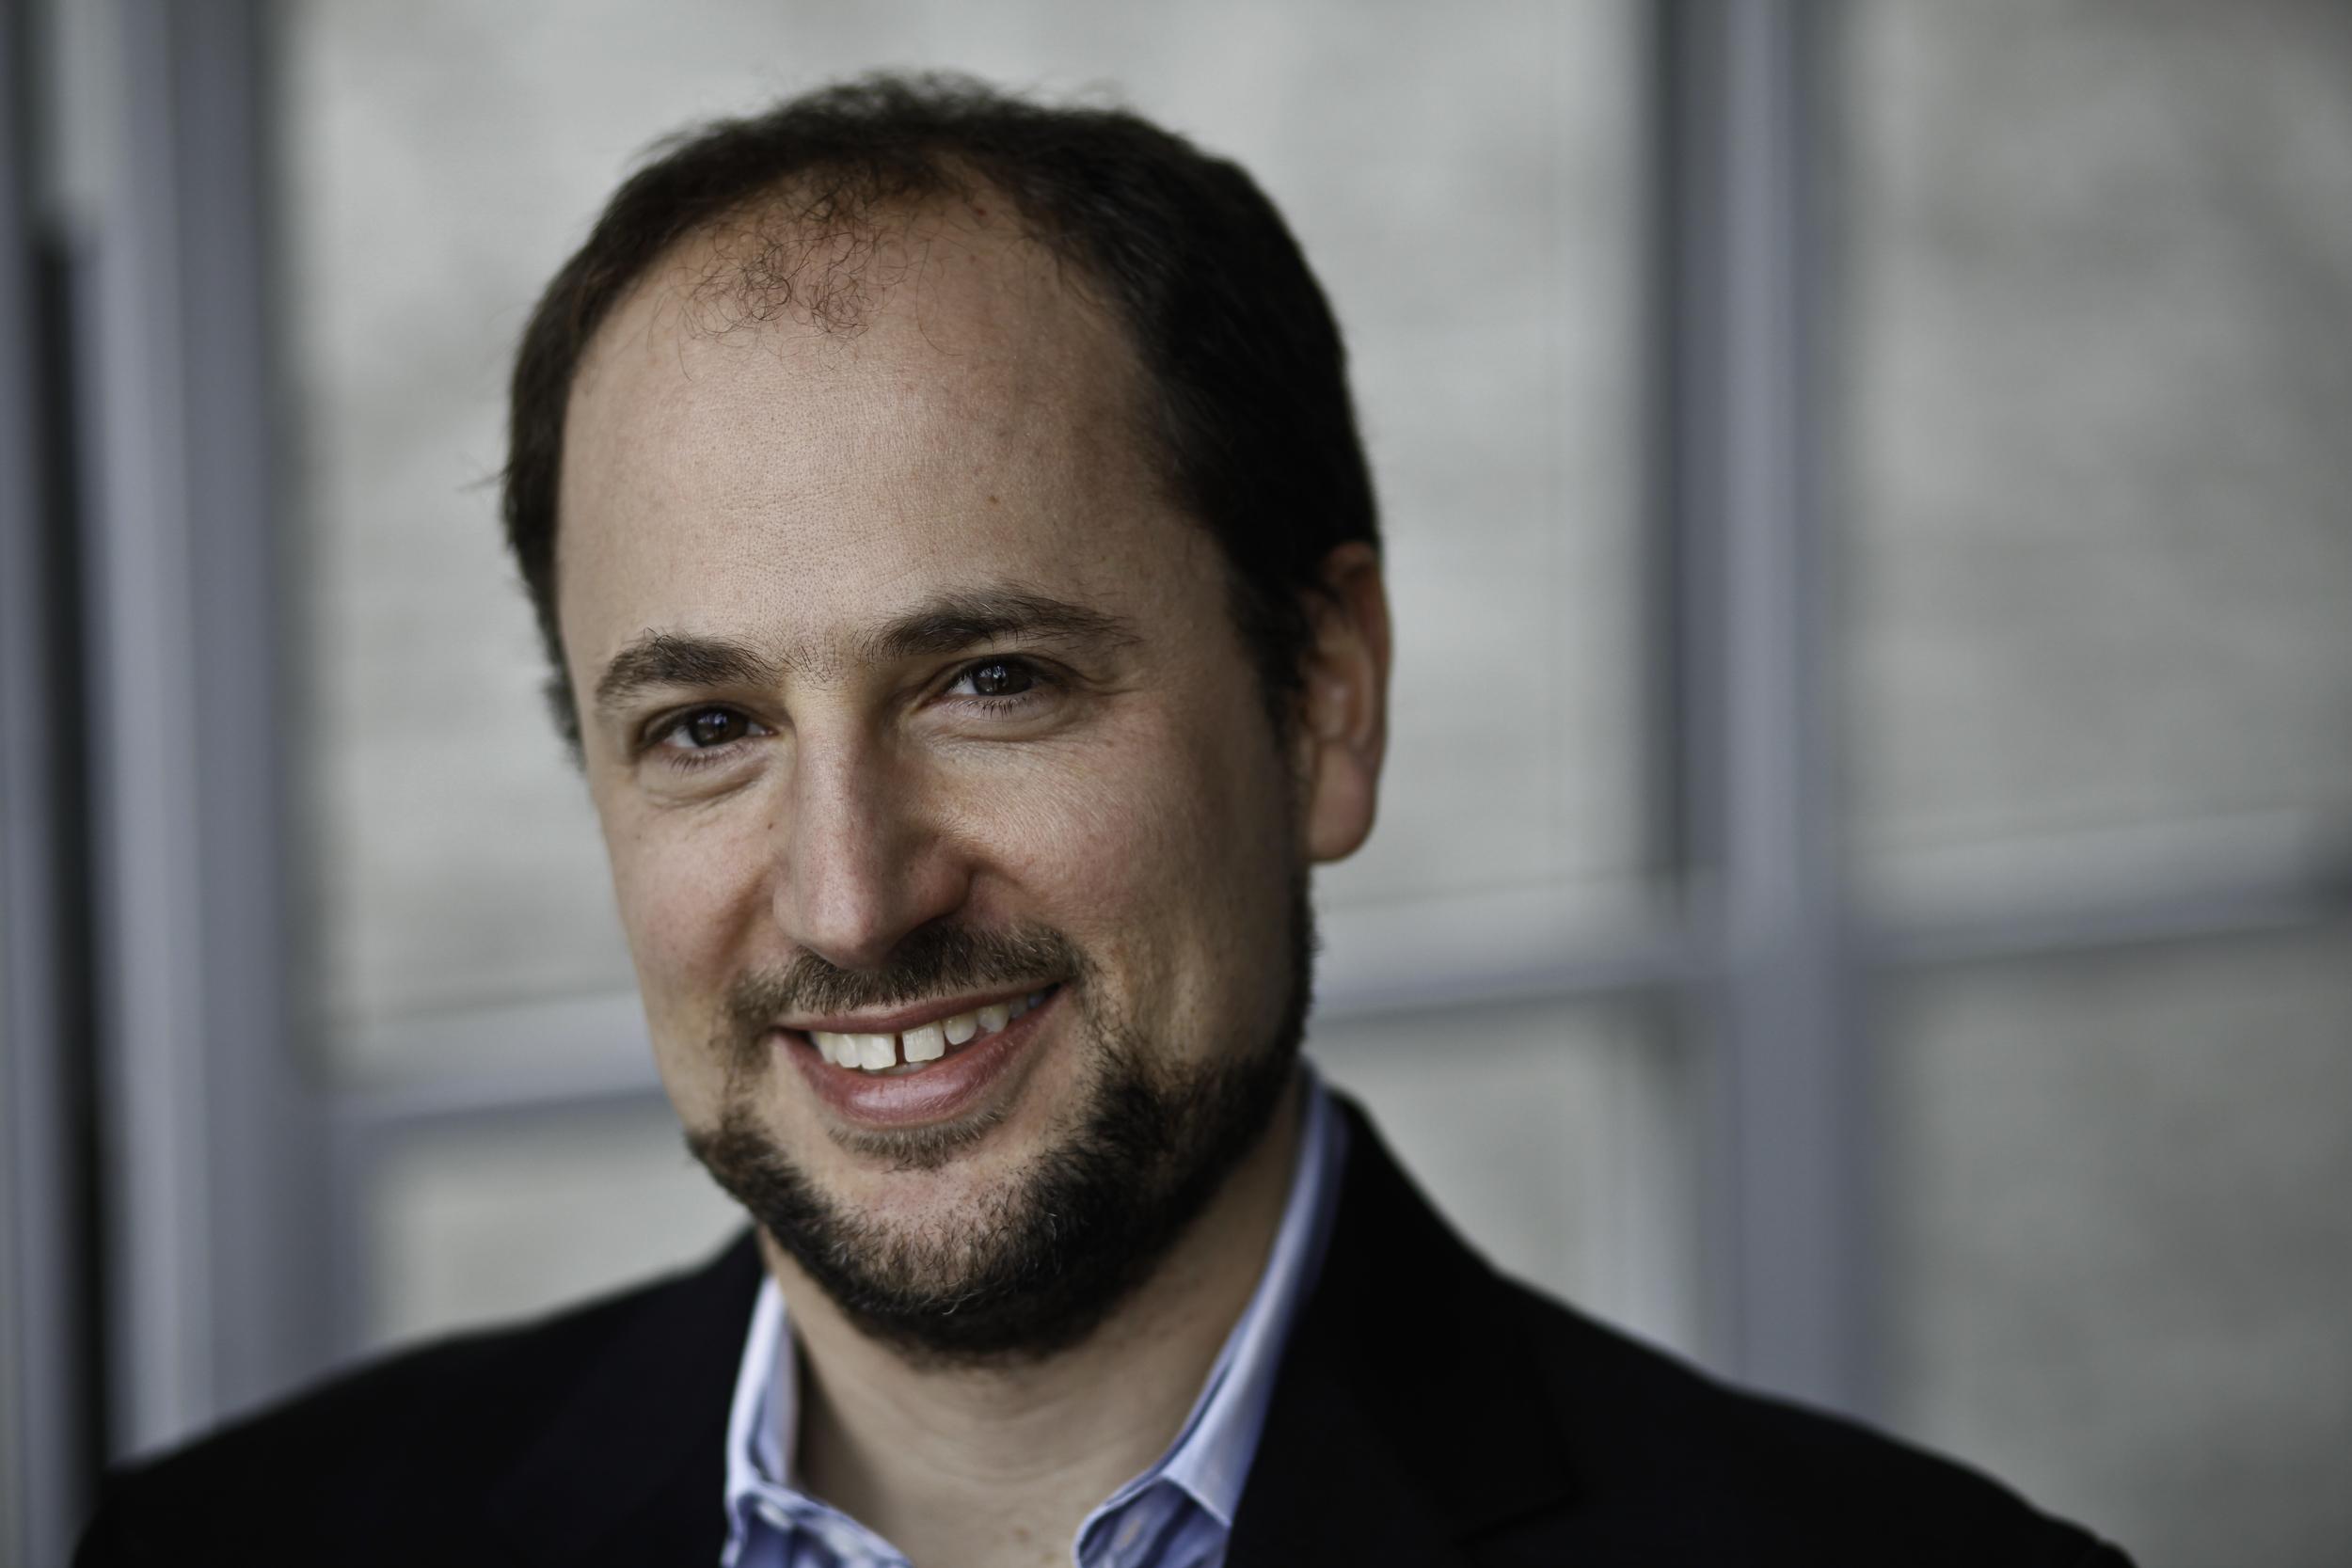 Greg Jacobs, Co-Director